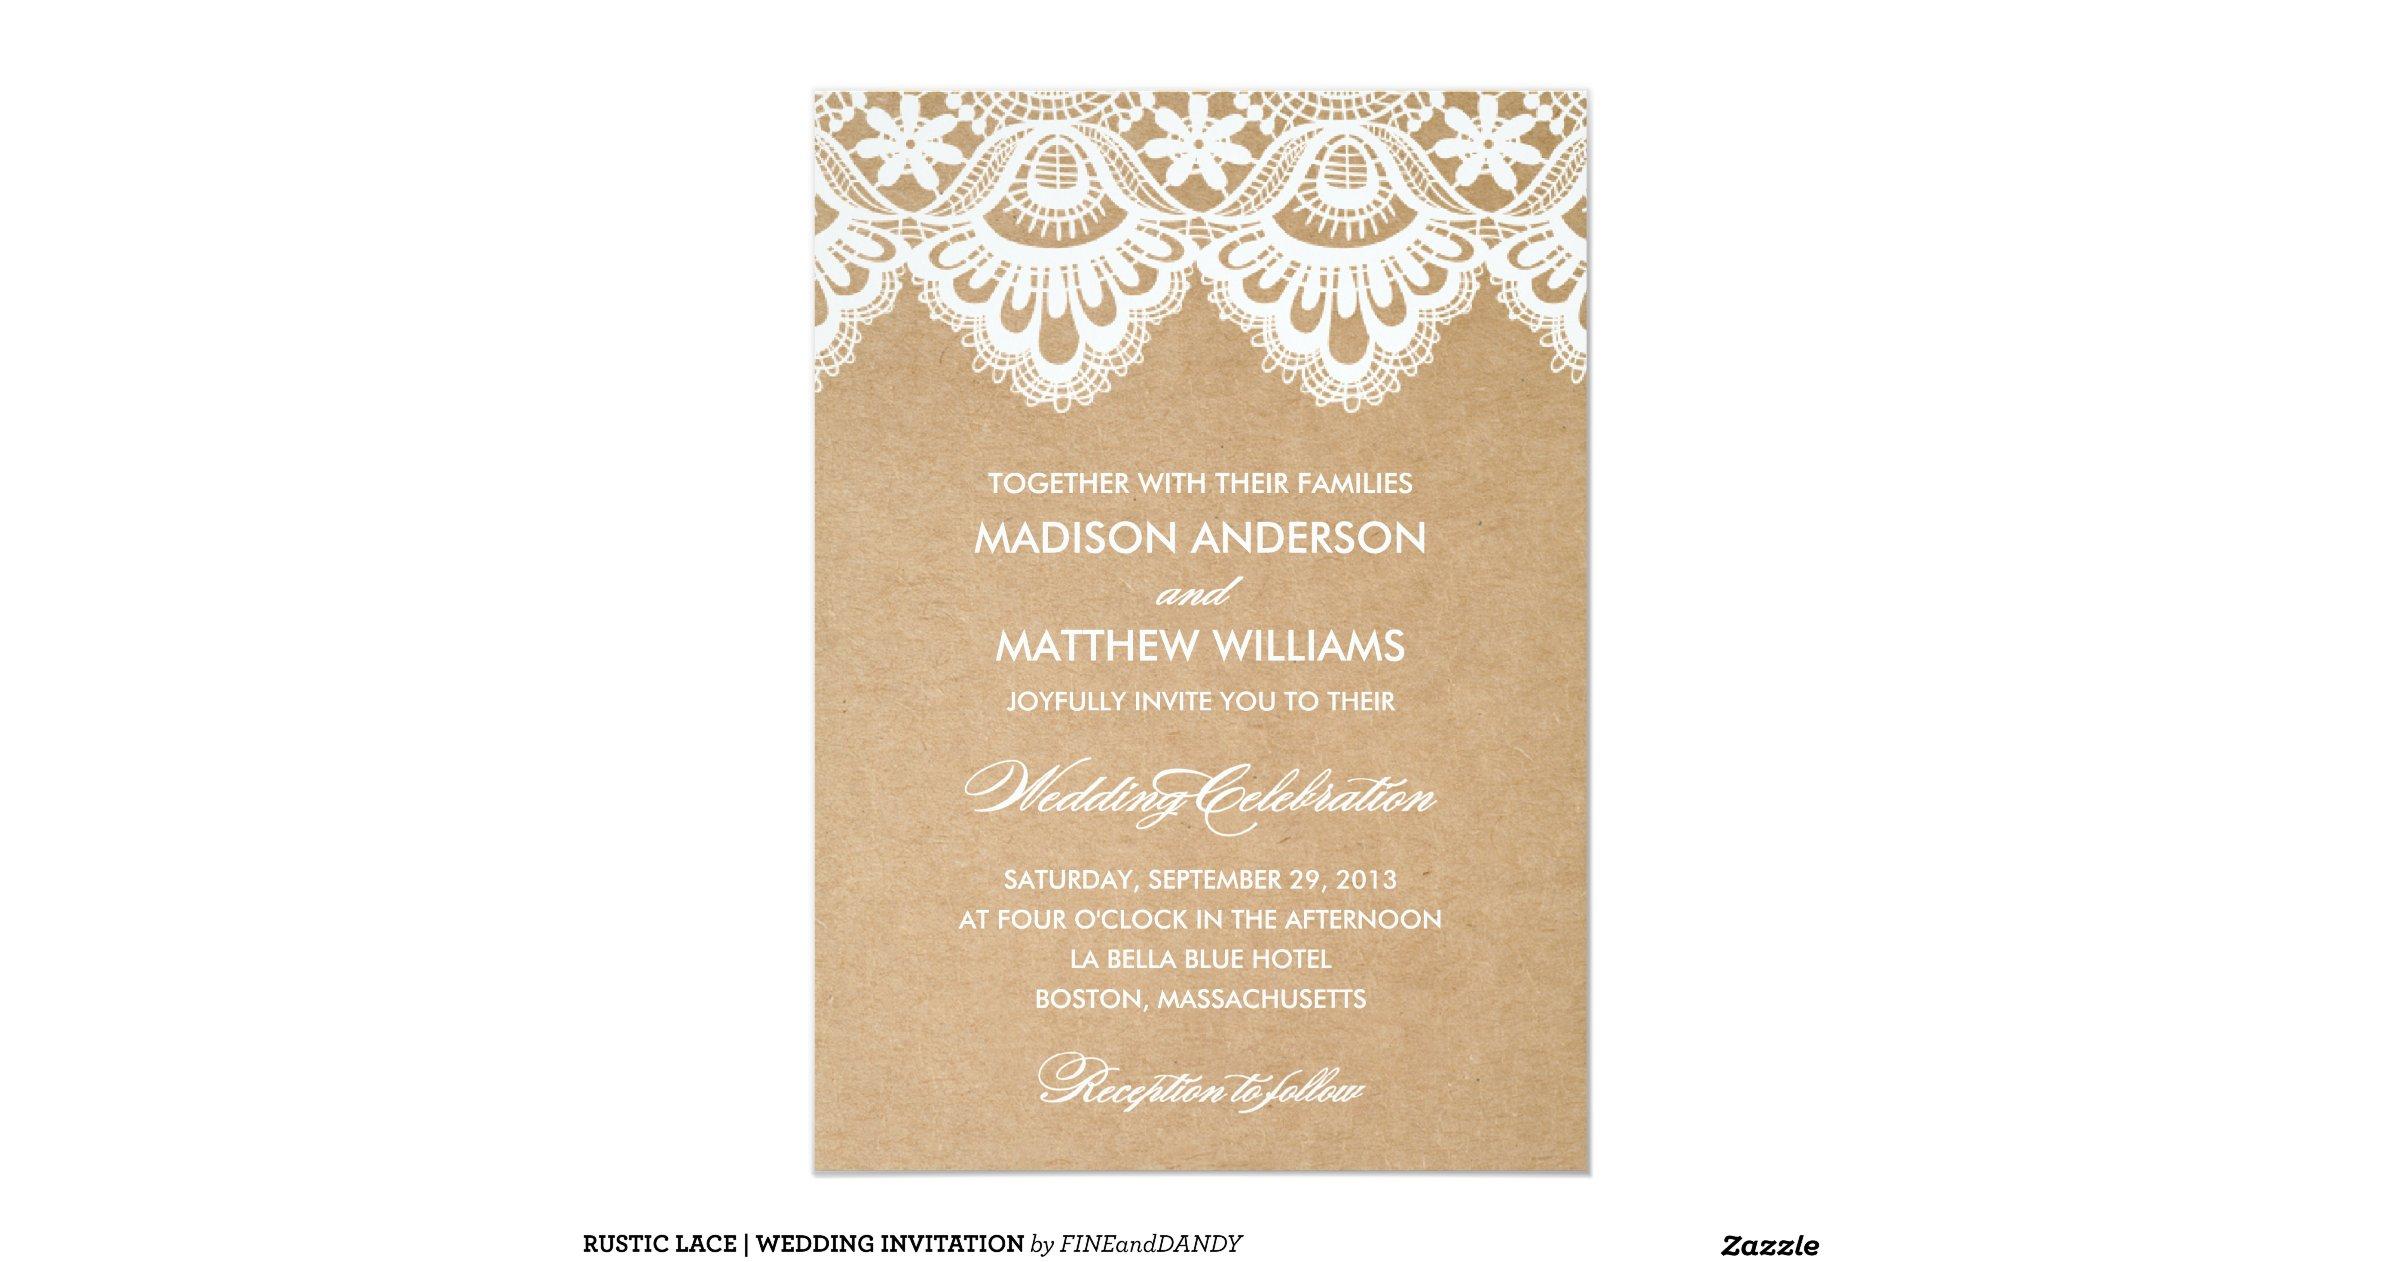 Rustic Lace Wedding Invitation Rd775e166e953415e8465edb1b8f8c010 Zkrqs 1200rlvnet1ampview